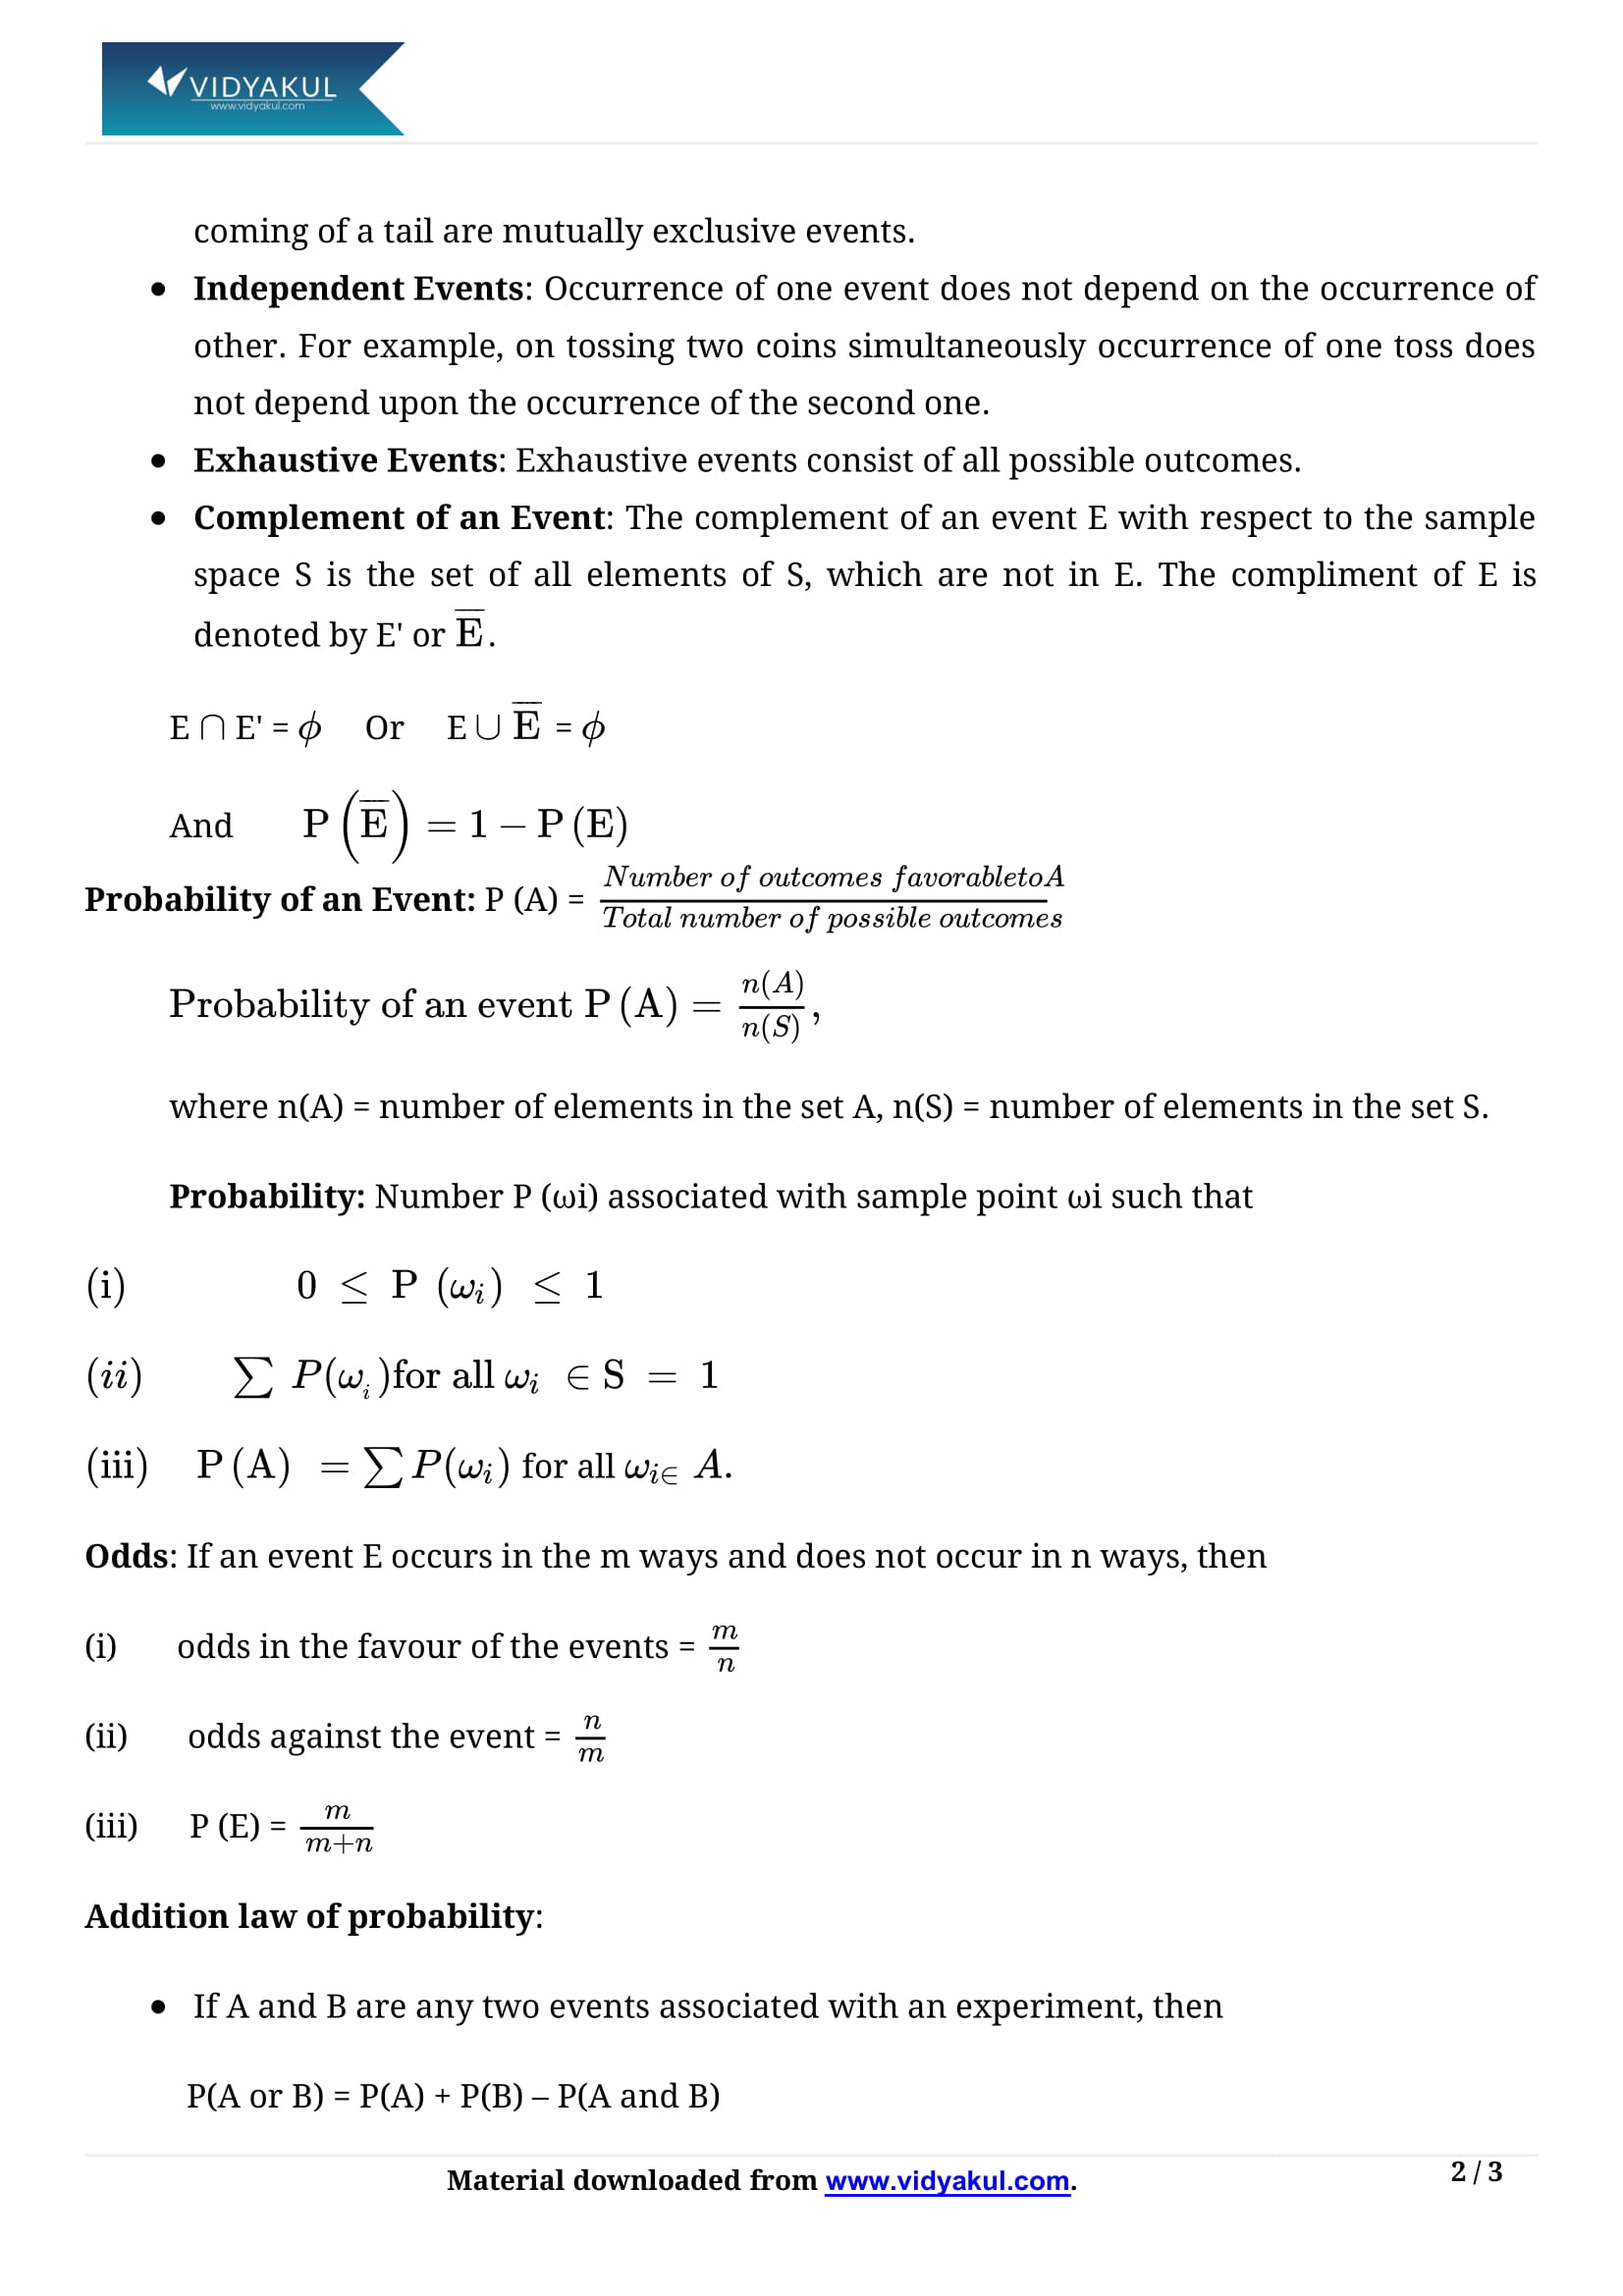 Probability Class 11 Formulas & Notes | Vidyakul